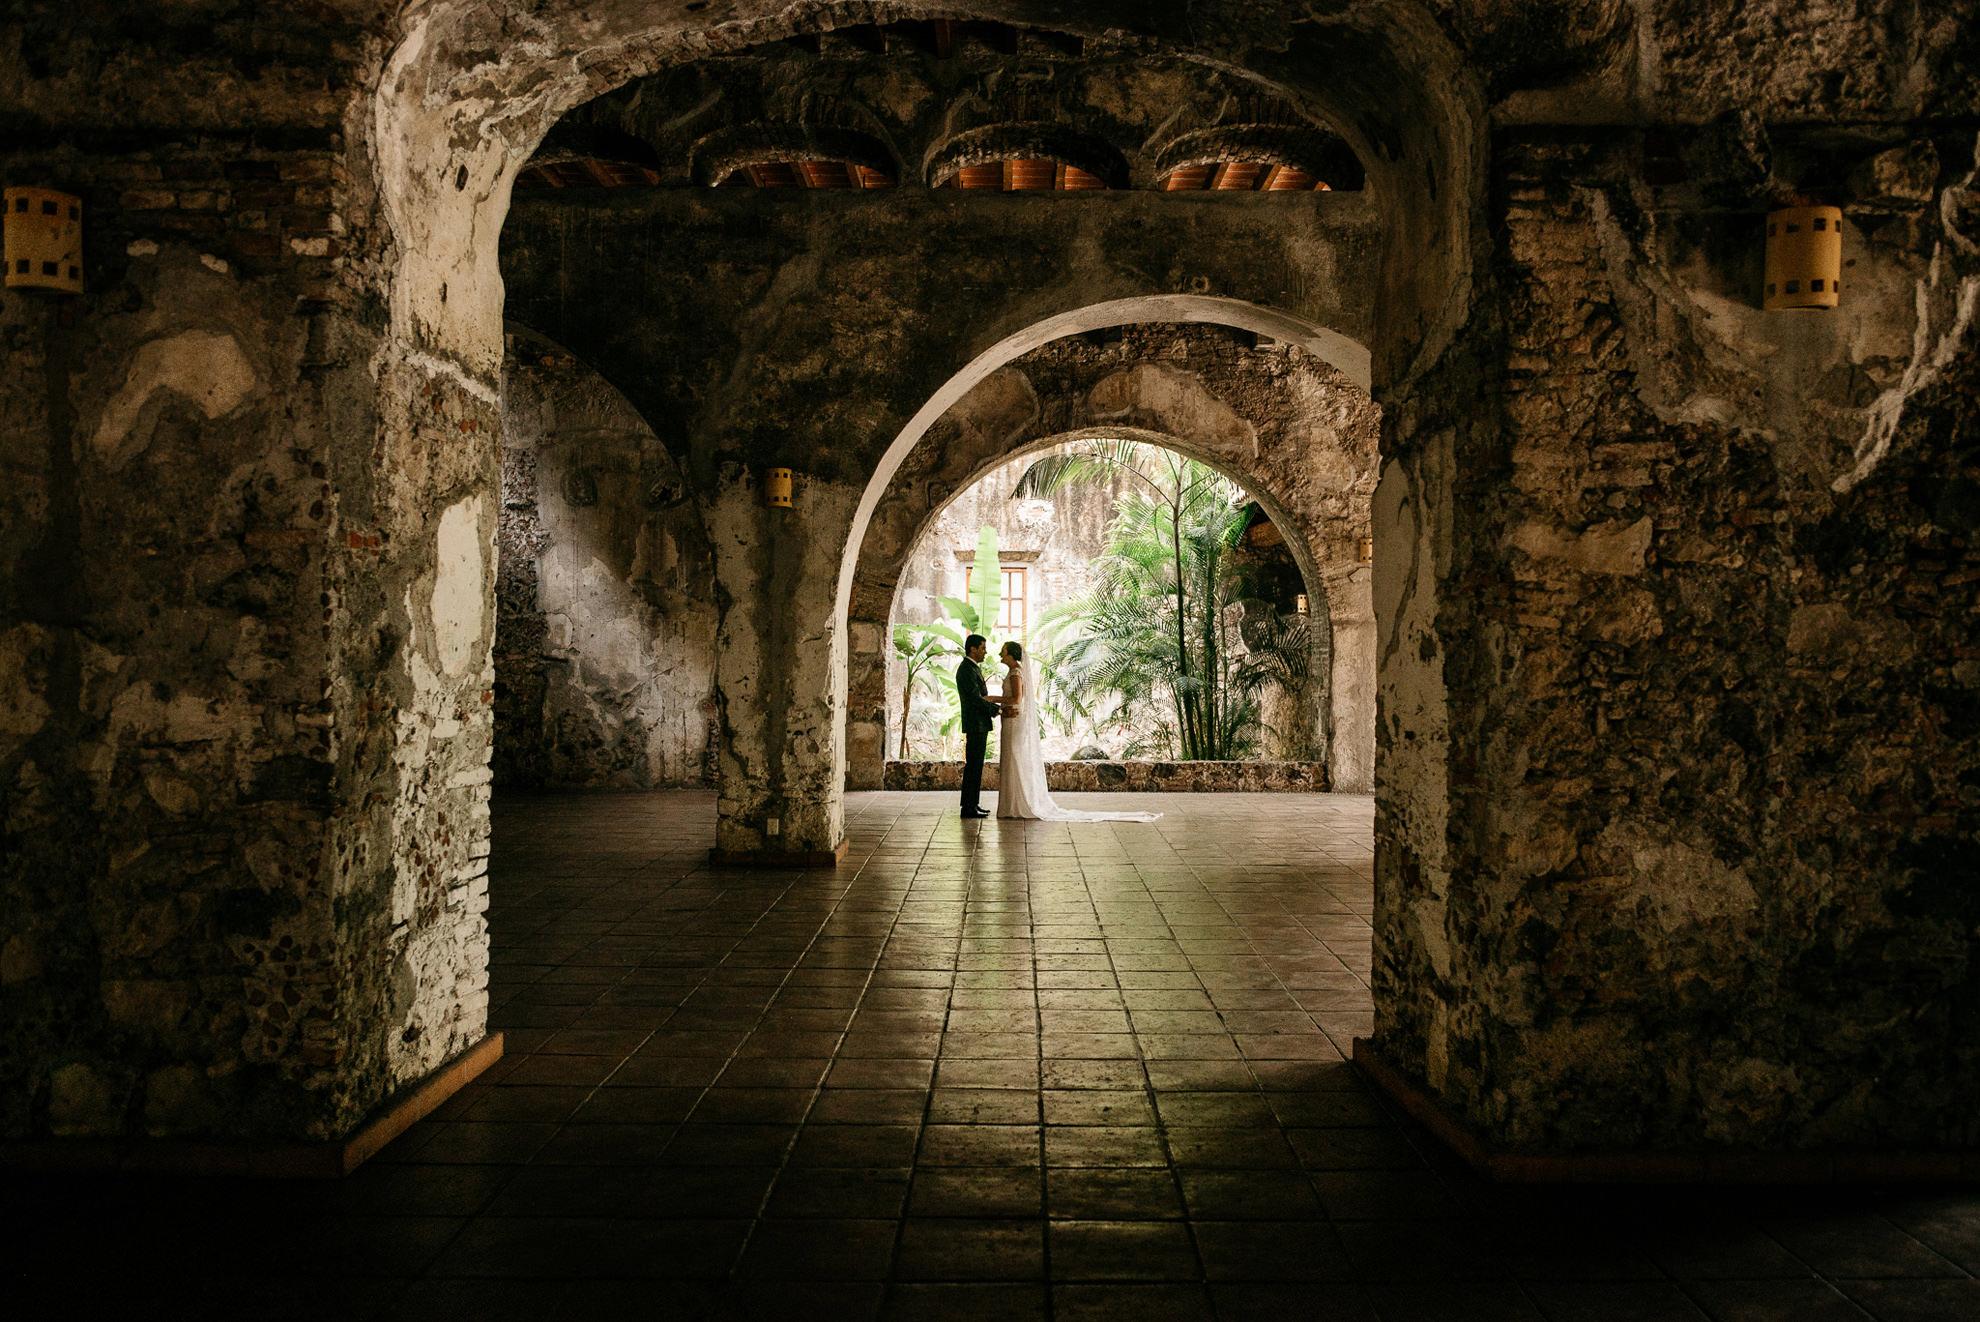 039 - hacienda san carlos.jpg